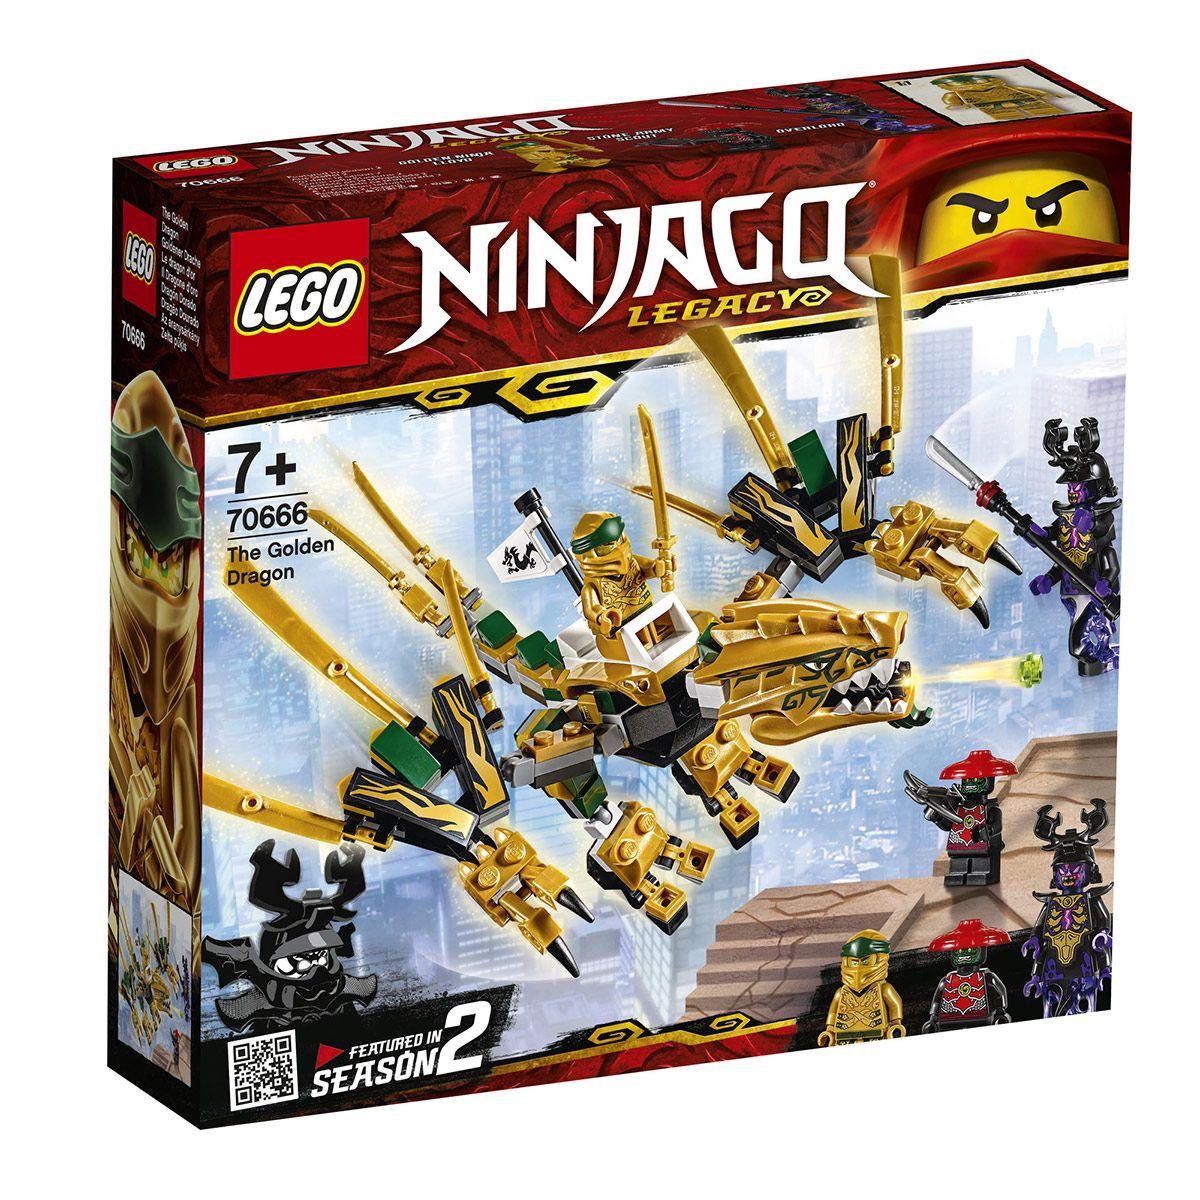 70666 Le Et Lego HérosCinéma Ninjago Super Jeux Dragon D'or yvbY67gf